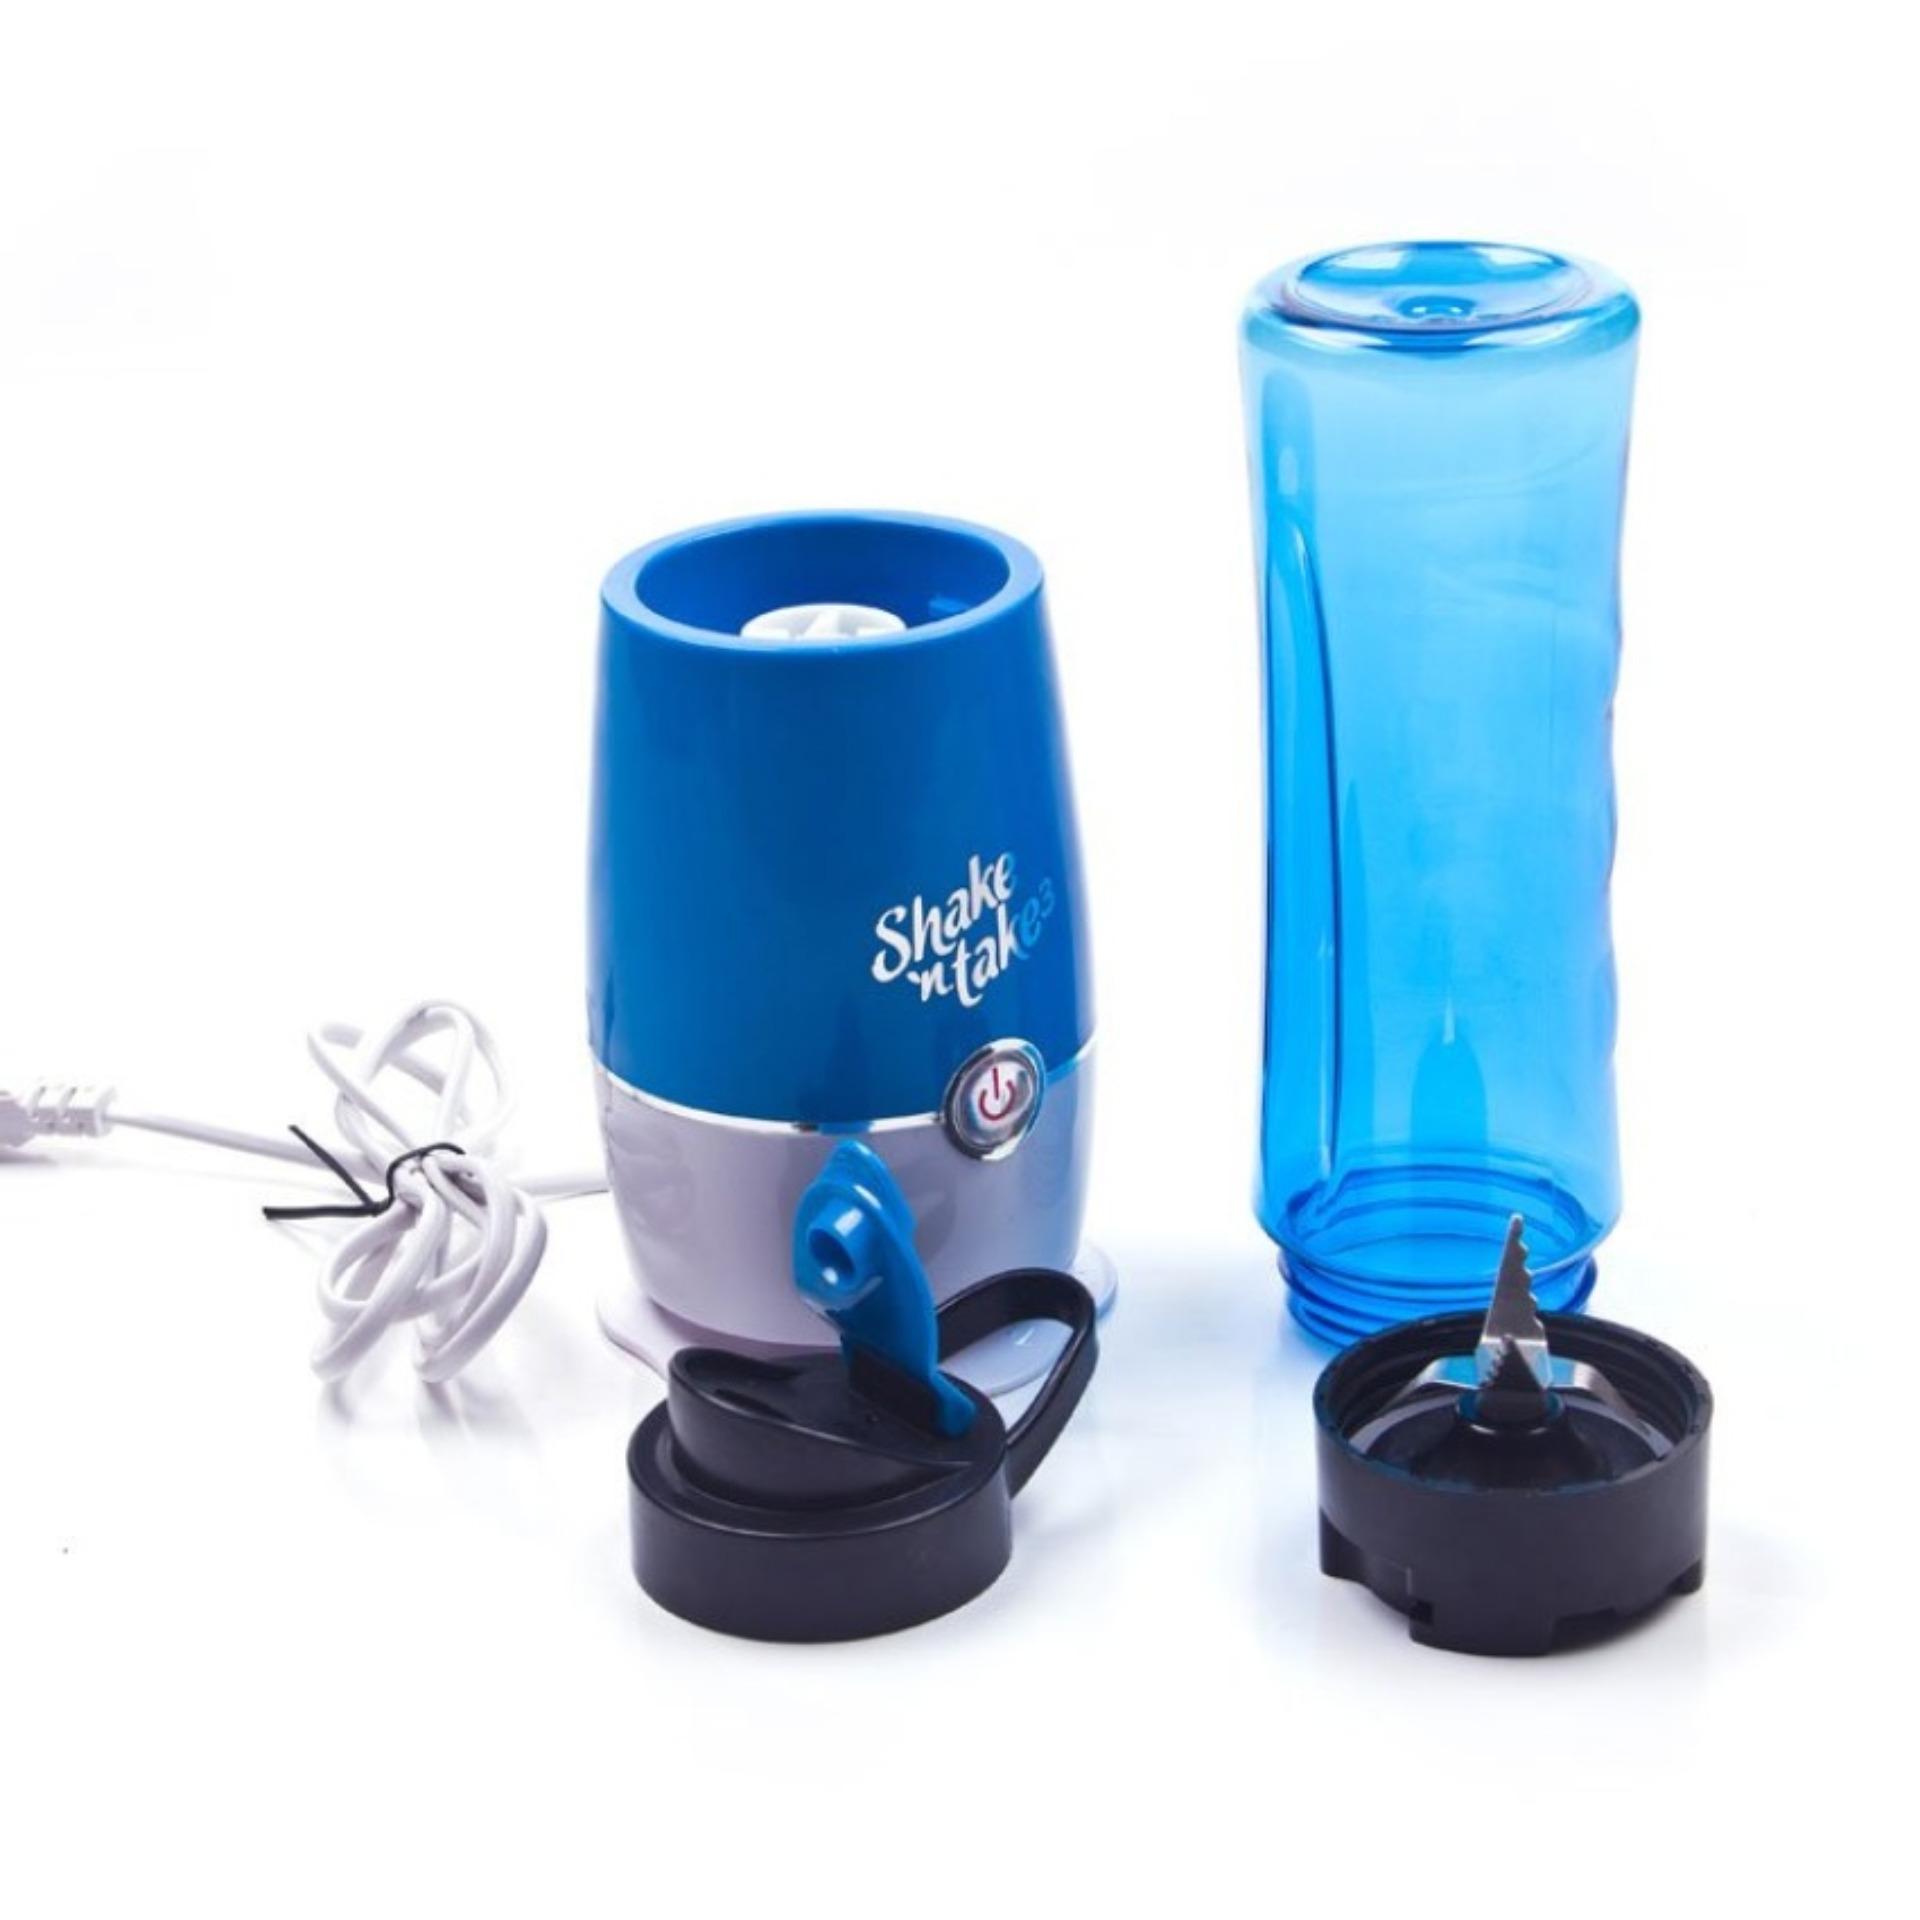 Blender Buah Dobule Cup Portable 2 in 1 500ml - Blue